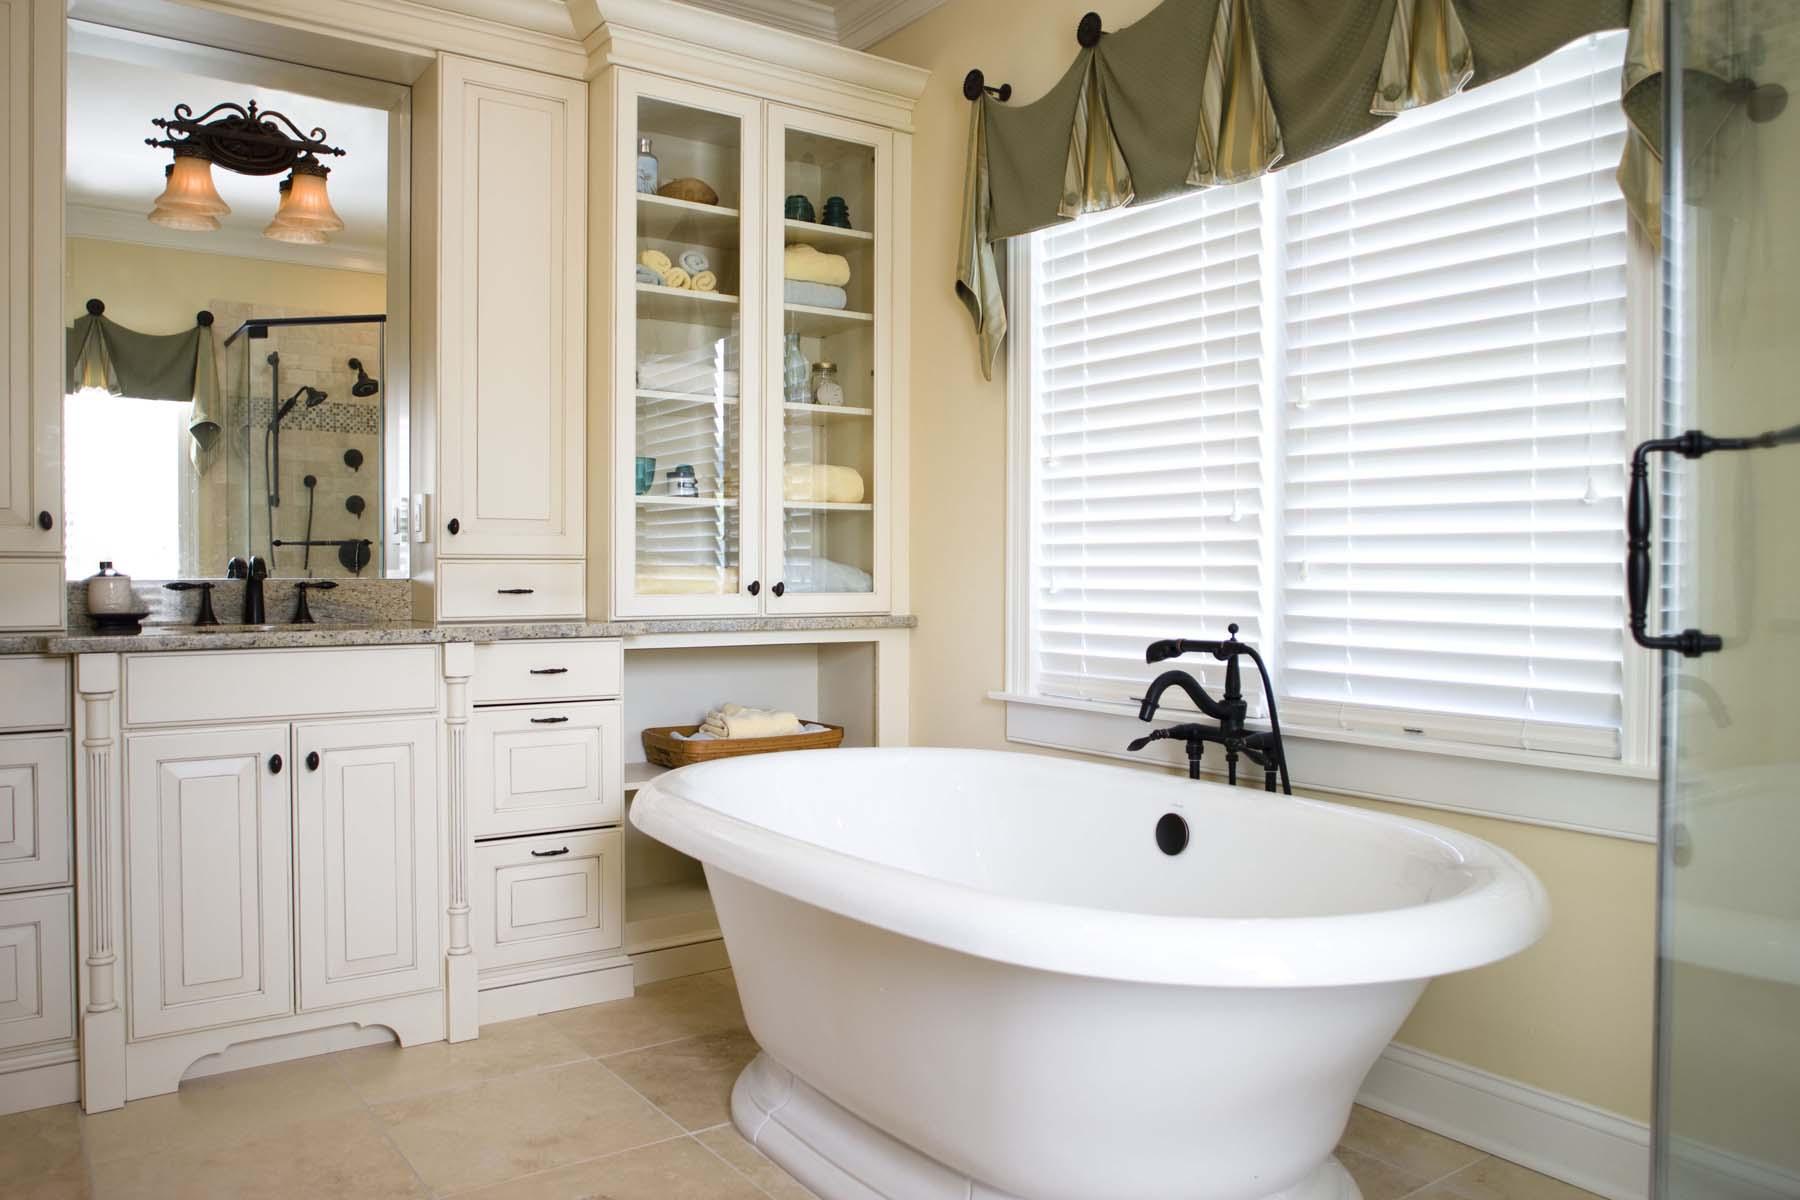 11 interior -  Wendy Holden  Associates LLC.jpg